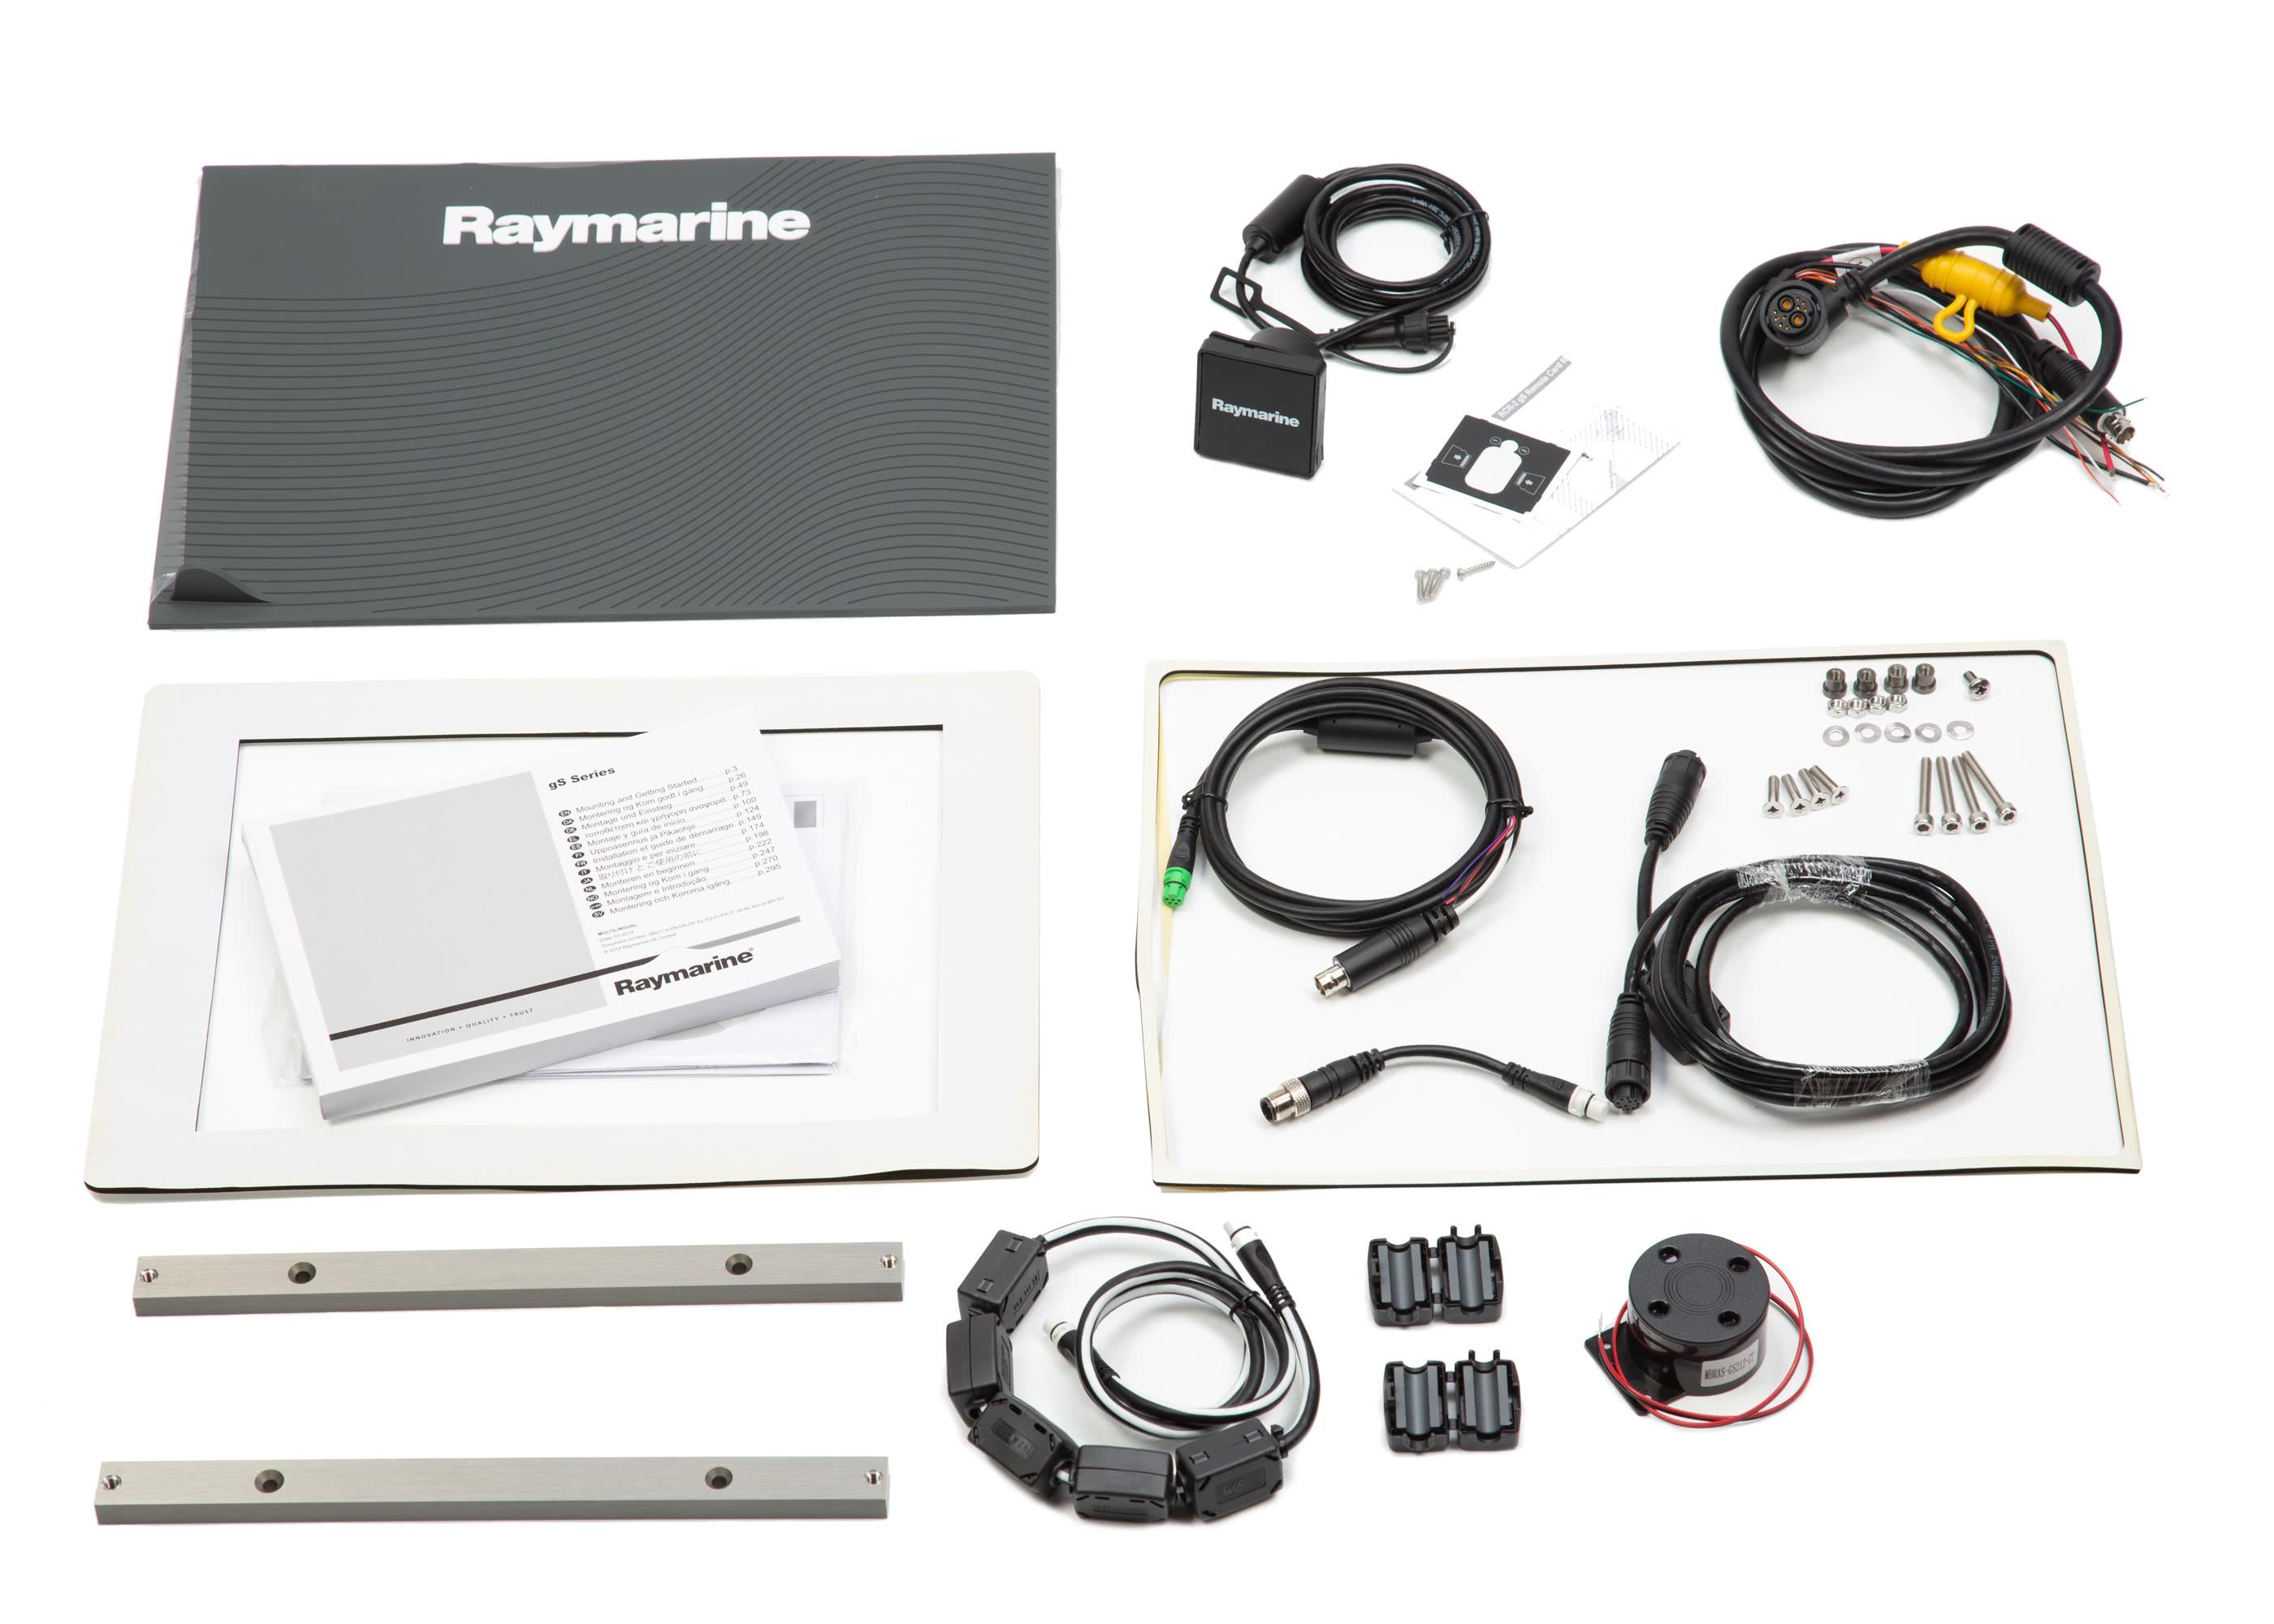 24822-Raymarine-Glass-bridge-MFD-gS165-15,4-touchscreen-1.jpg